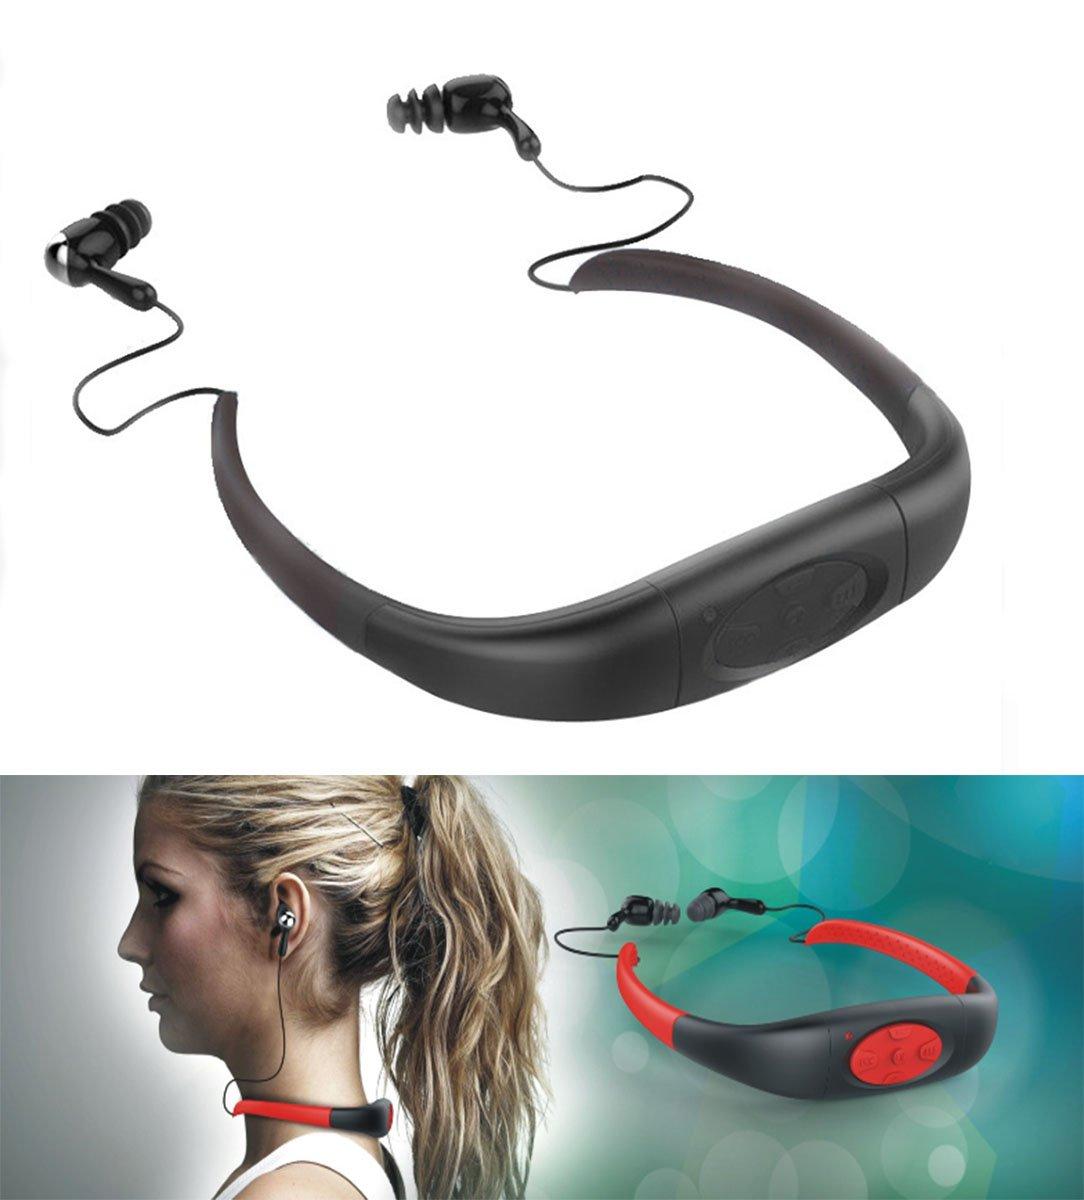 iTecoSky Waterproof Underwater Neckband Headphone